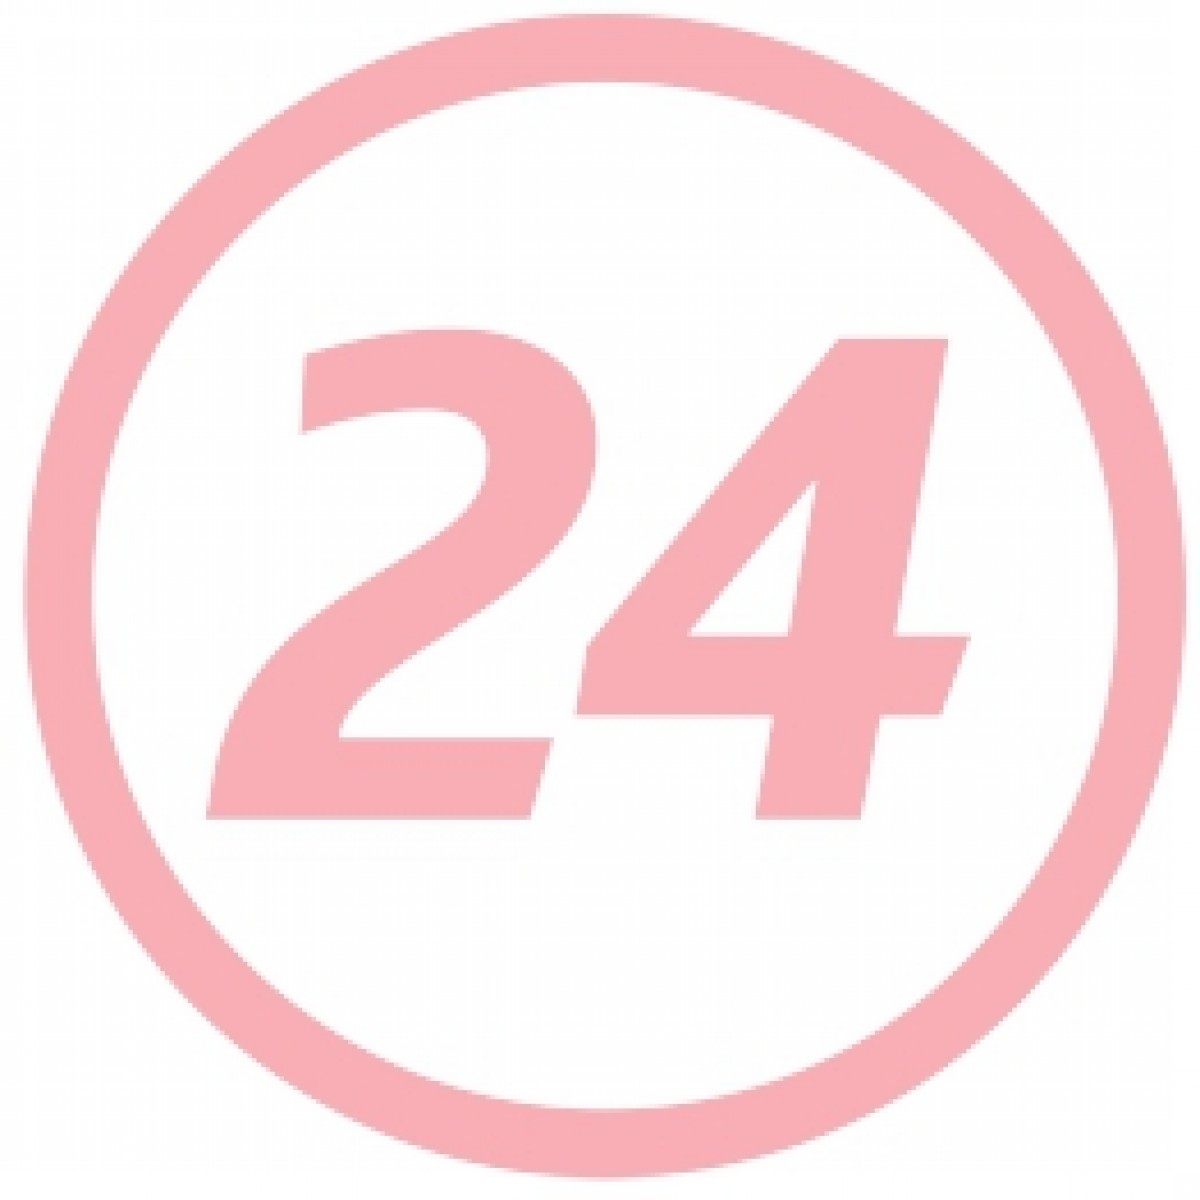 EasyCarePlasturi Gel Pentru Febra si Dureri de Cap 4buc